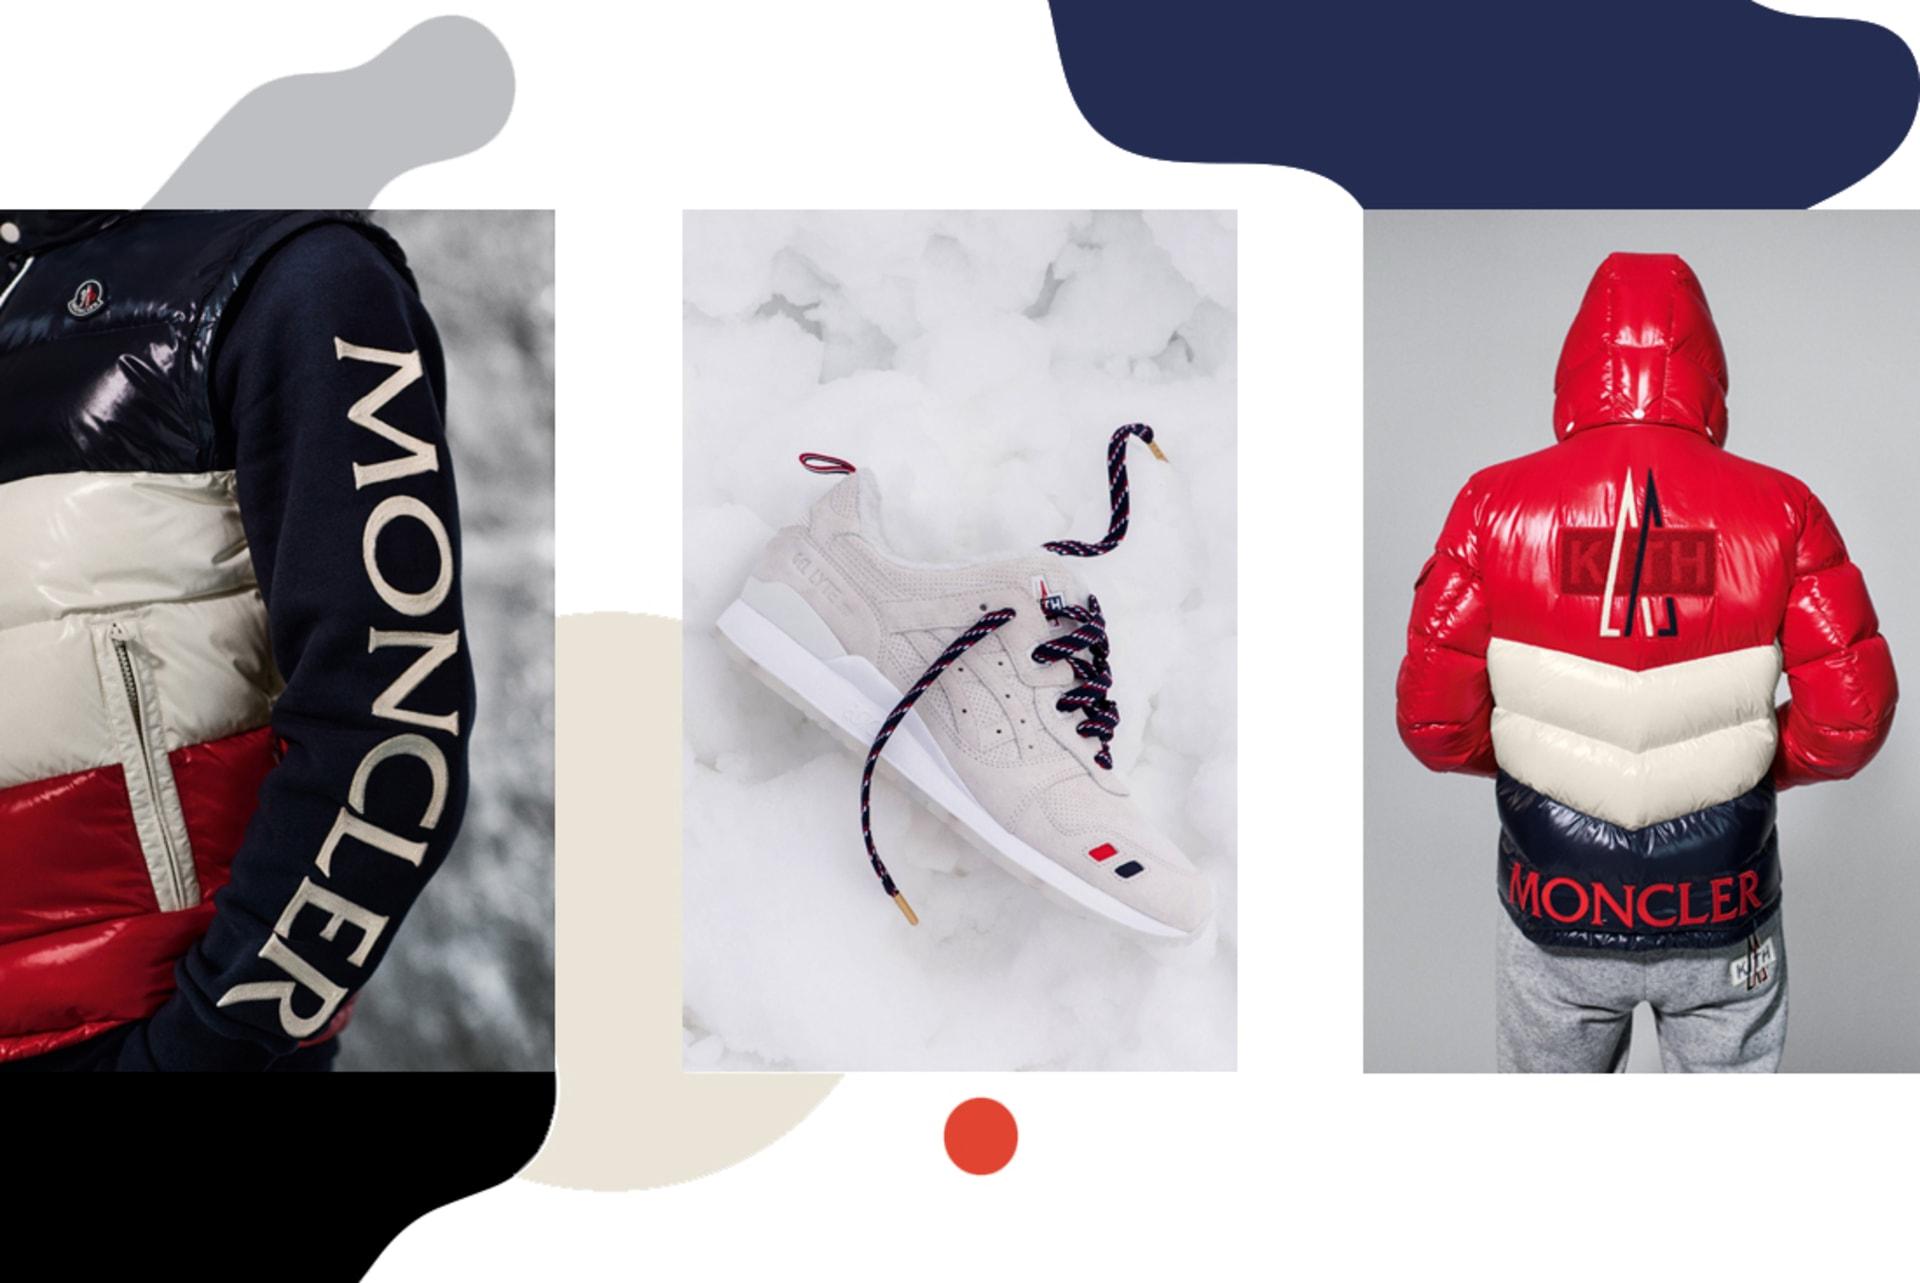 81c48b389b47 Best Streetwear Collaborations of 2017